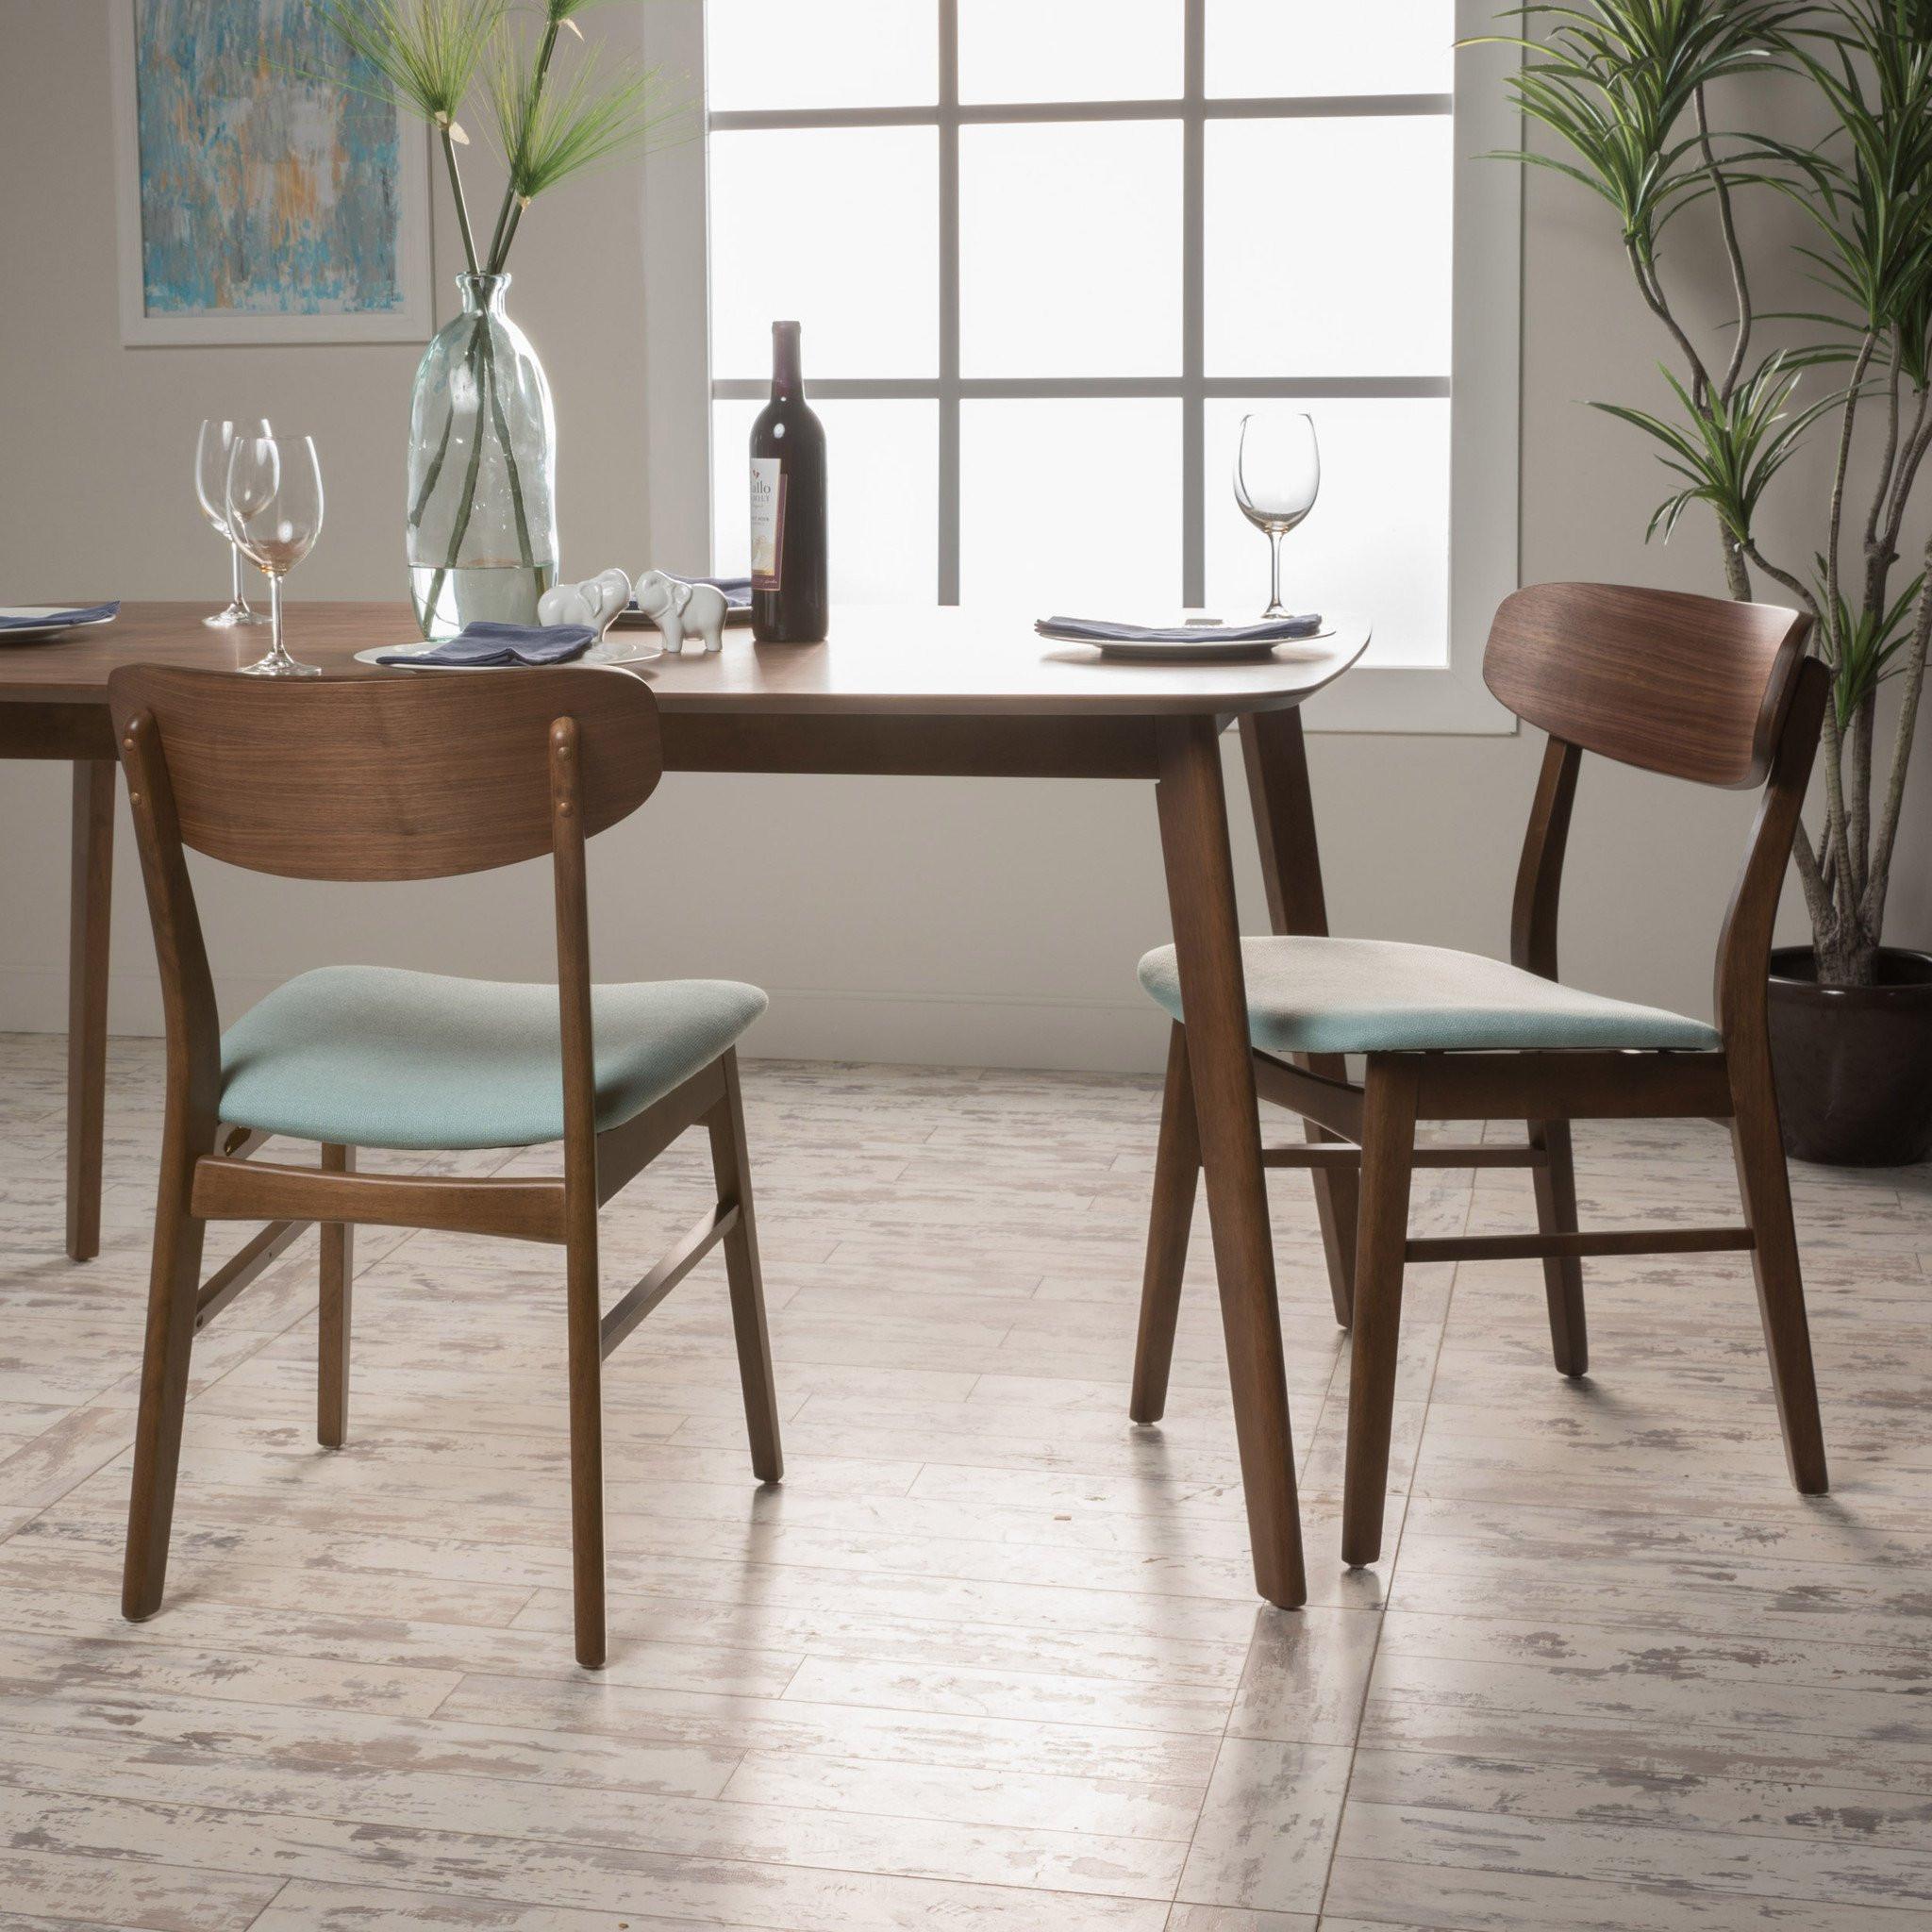 Alexis Mint Fabric/ Walnut Finish Dining Chair (Se...